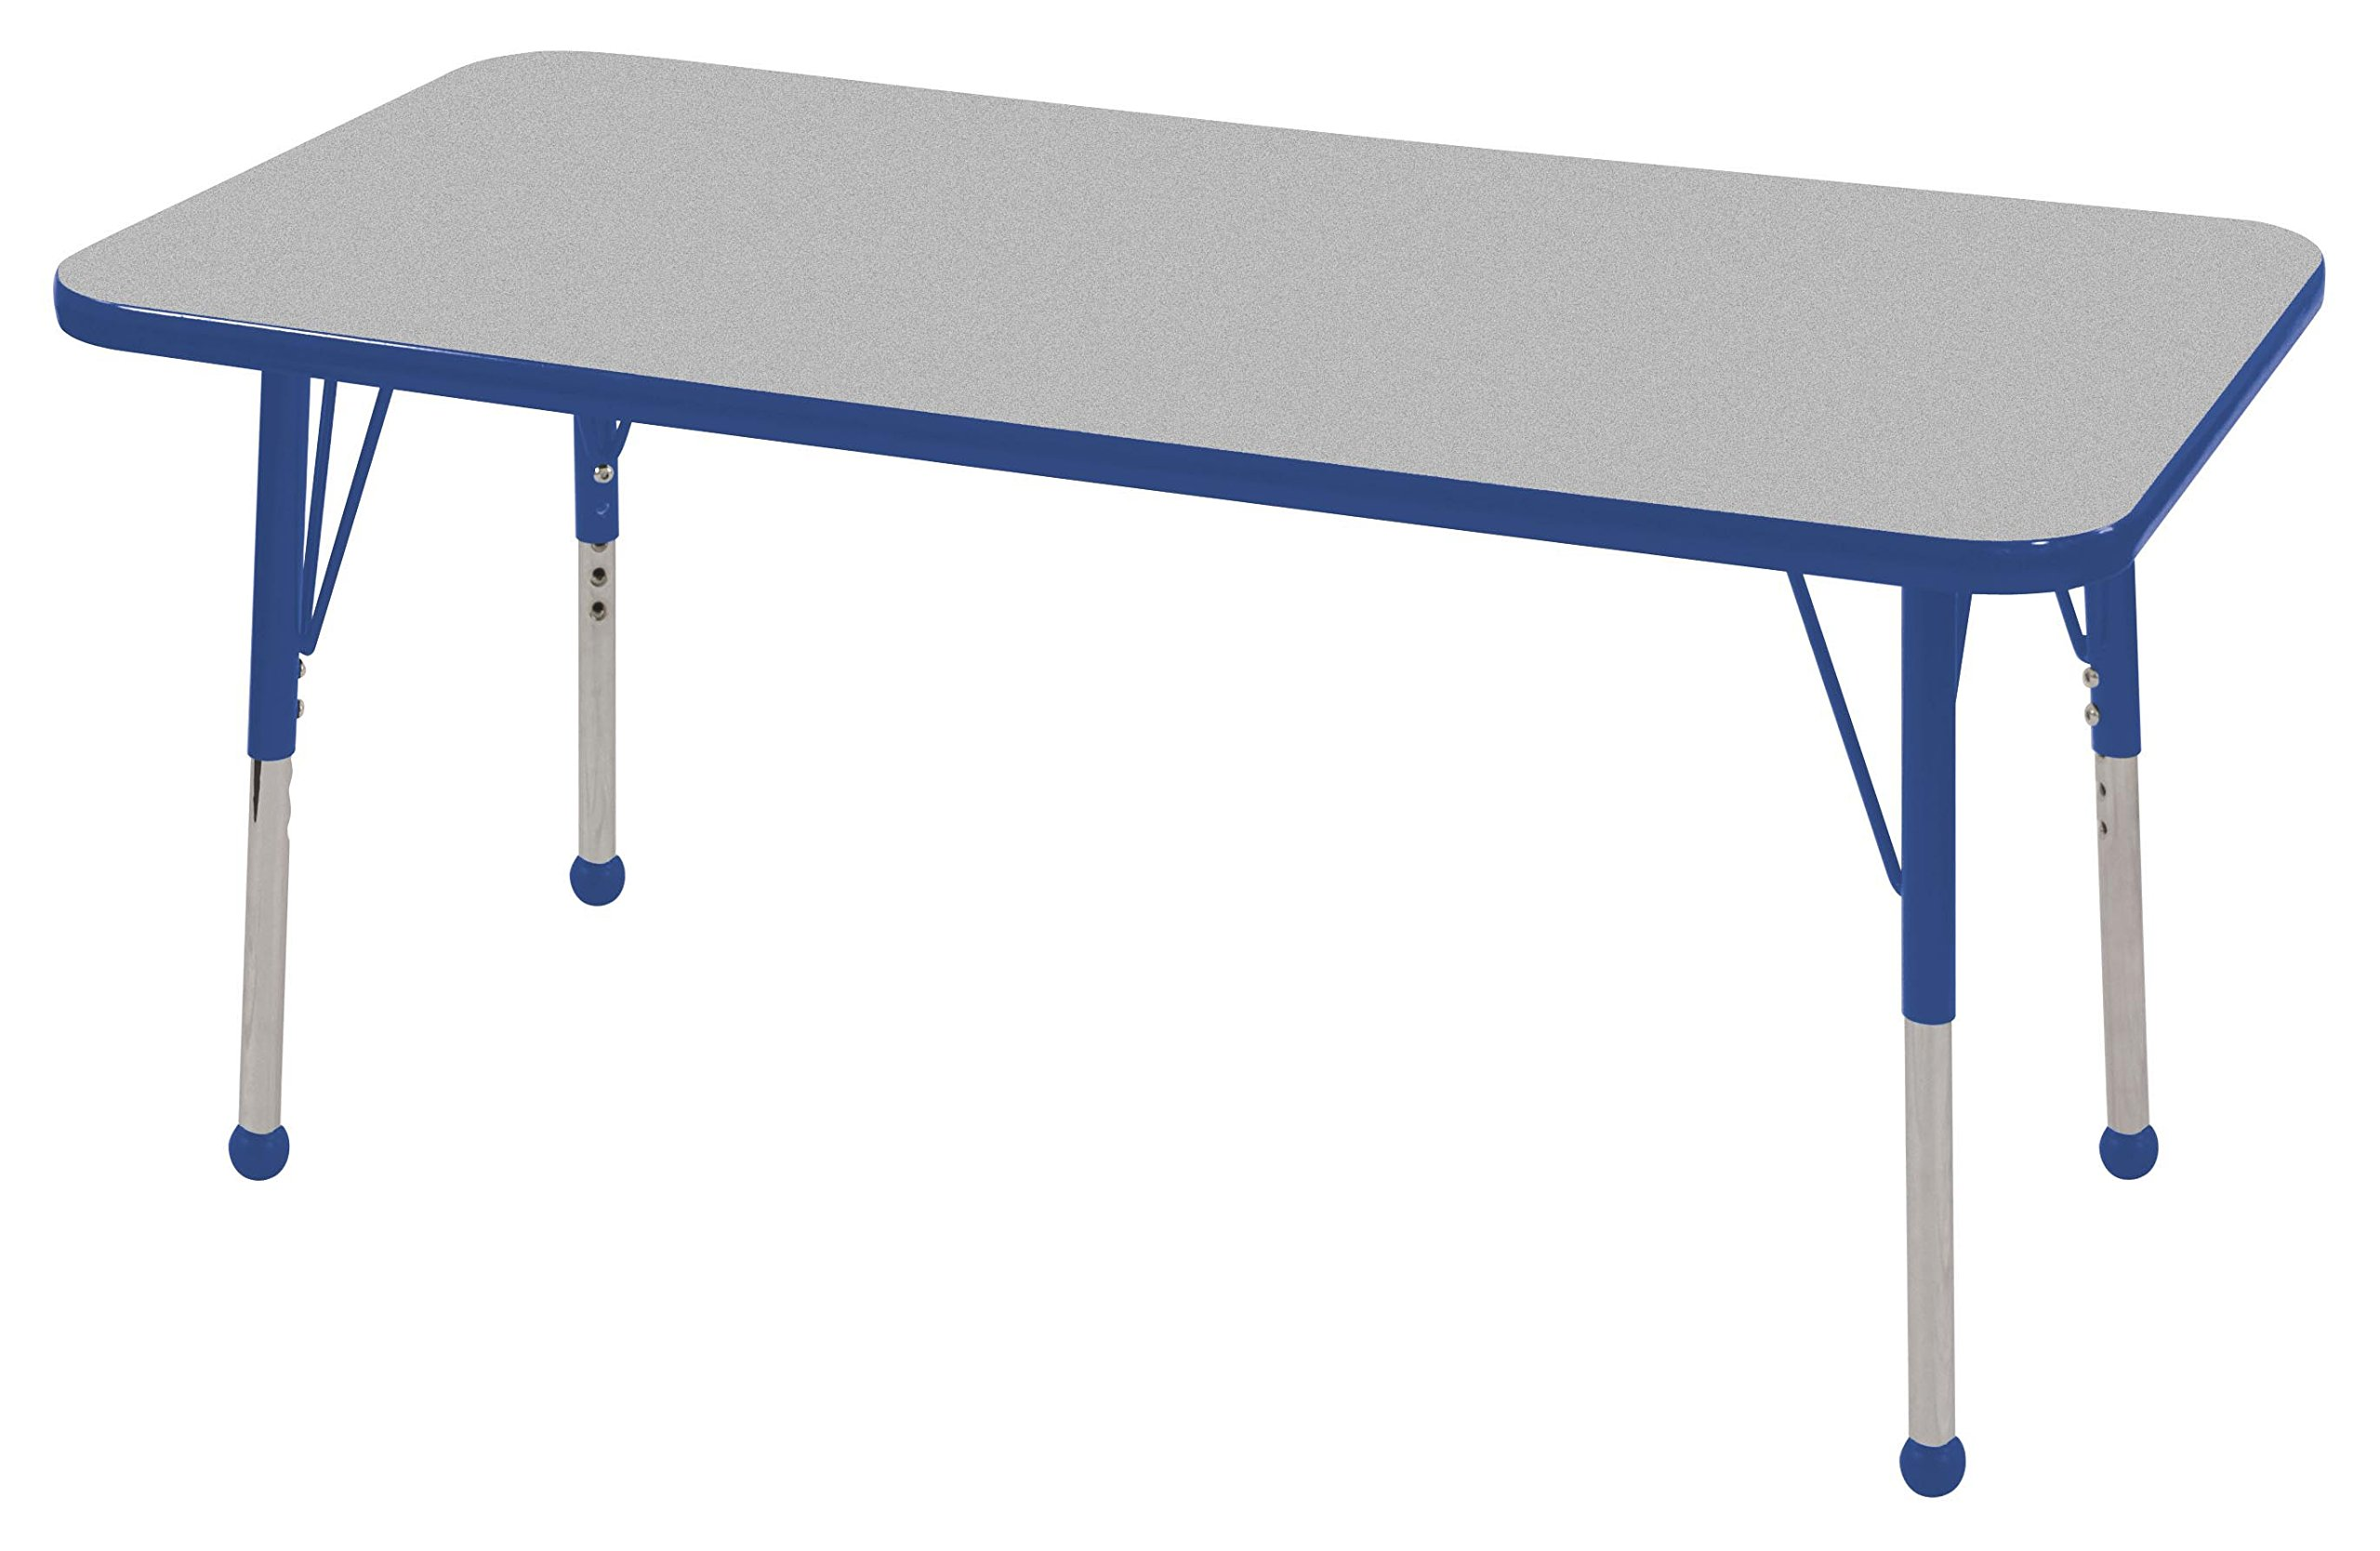 ECR4Kids Mesa T-Mold 24'' x 48'' Rectangular School Activity Table, Standard Legs w/ Ball Glides, Adjustable Height 19-30 inch (Grey/Blue)